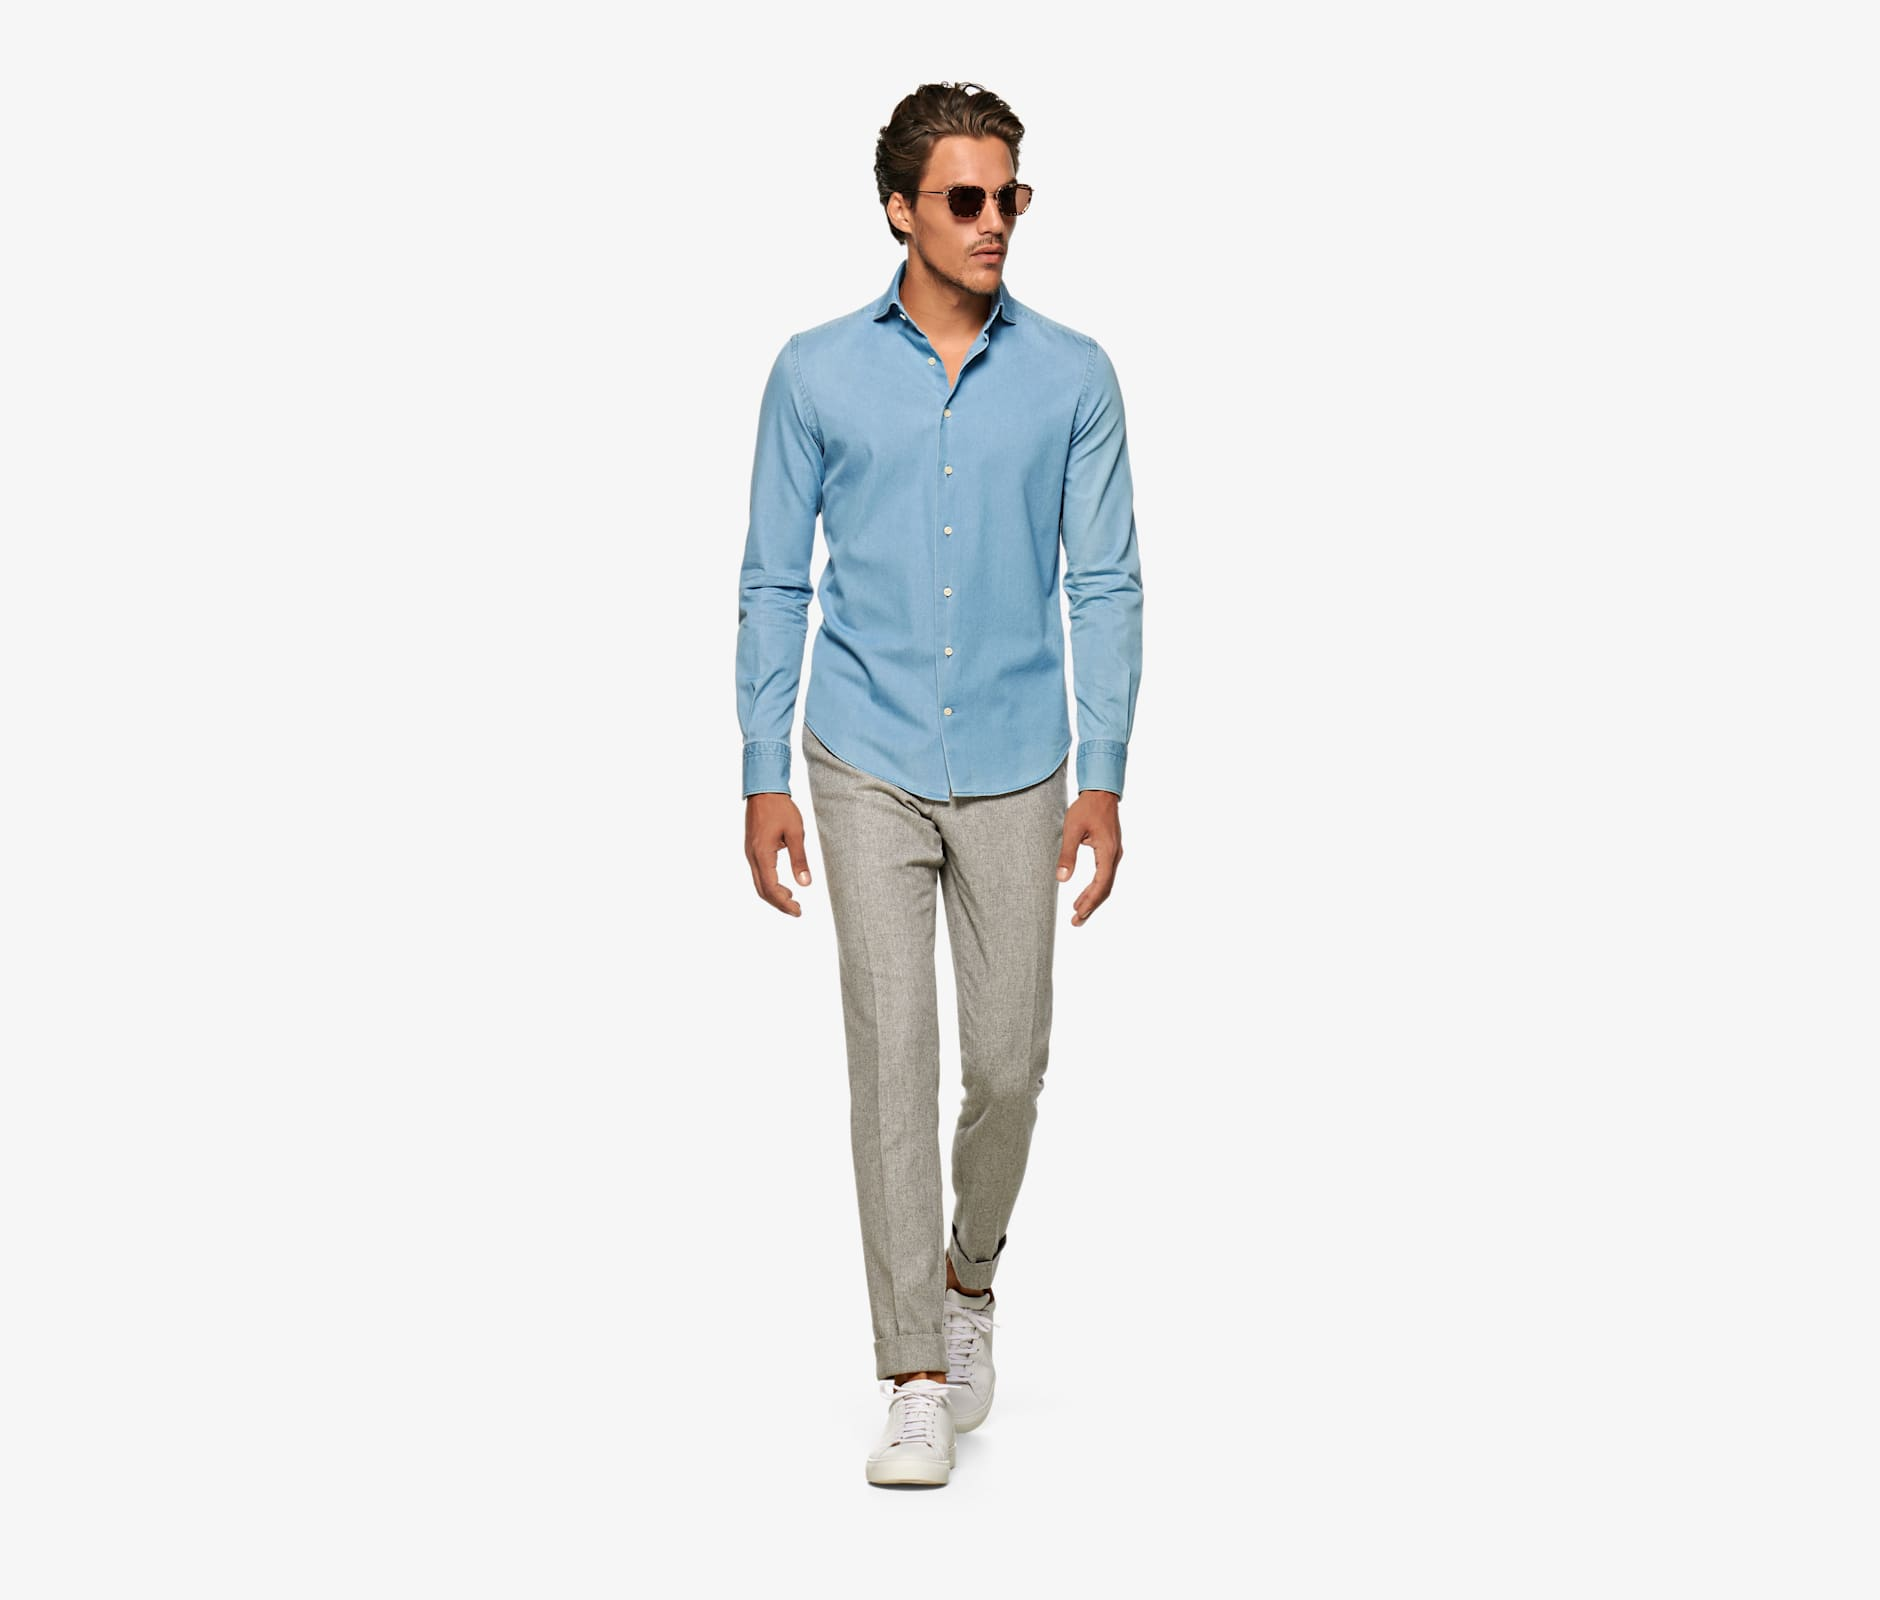 Blue_Denim_Shirt_Single_Cuff_H9061U